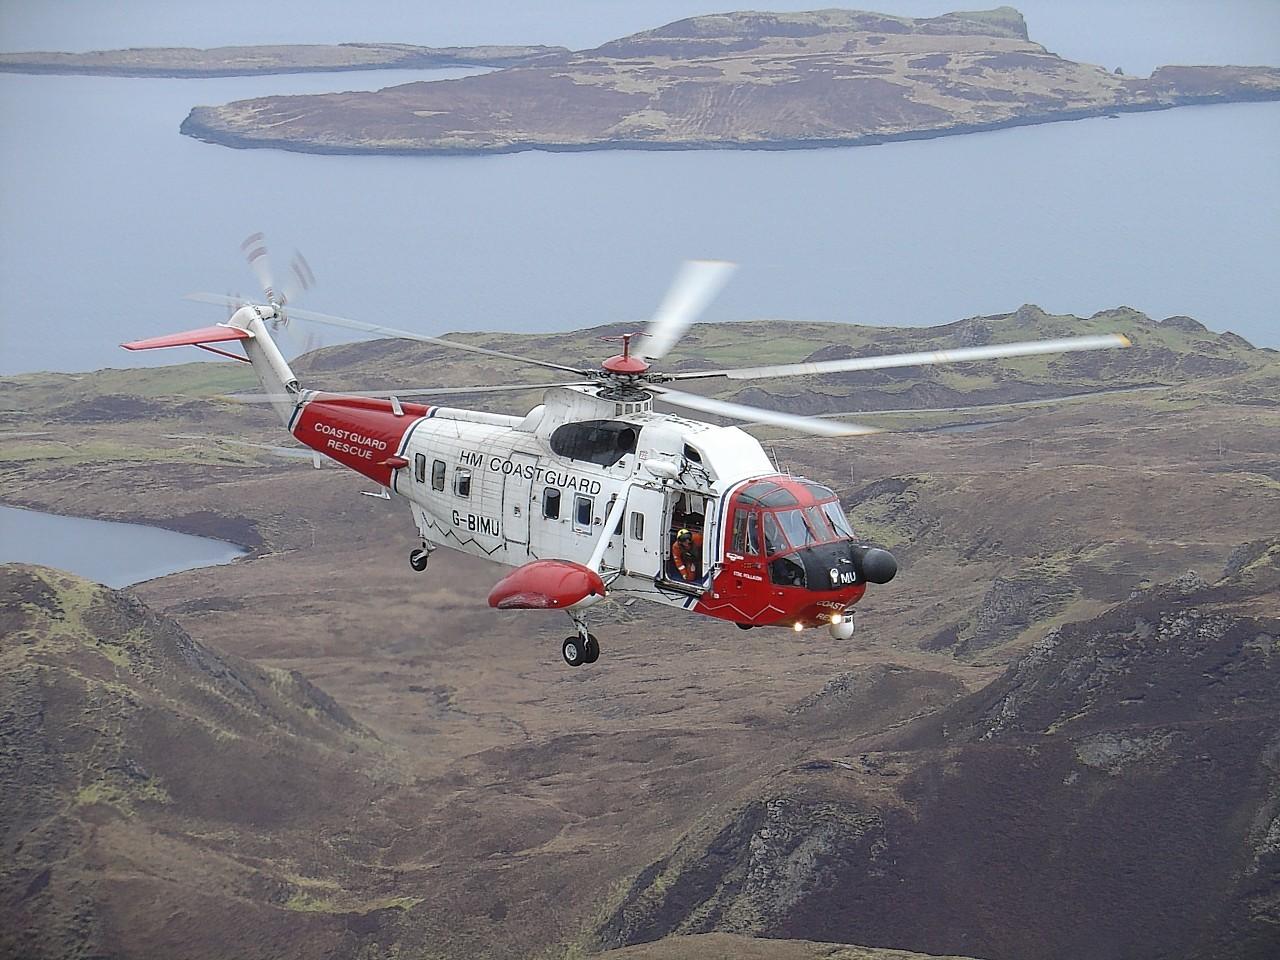 The Stornoway coastguard was called